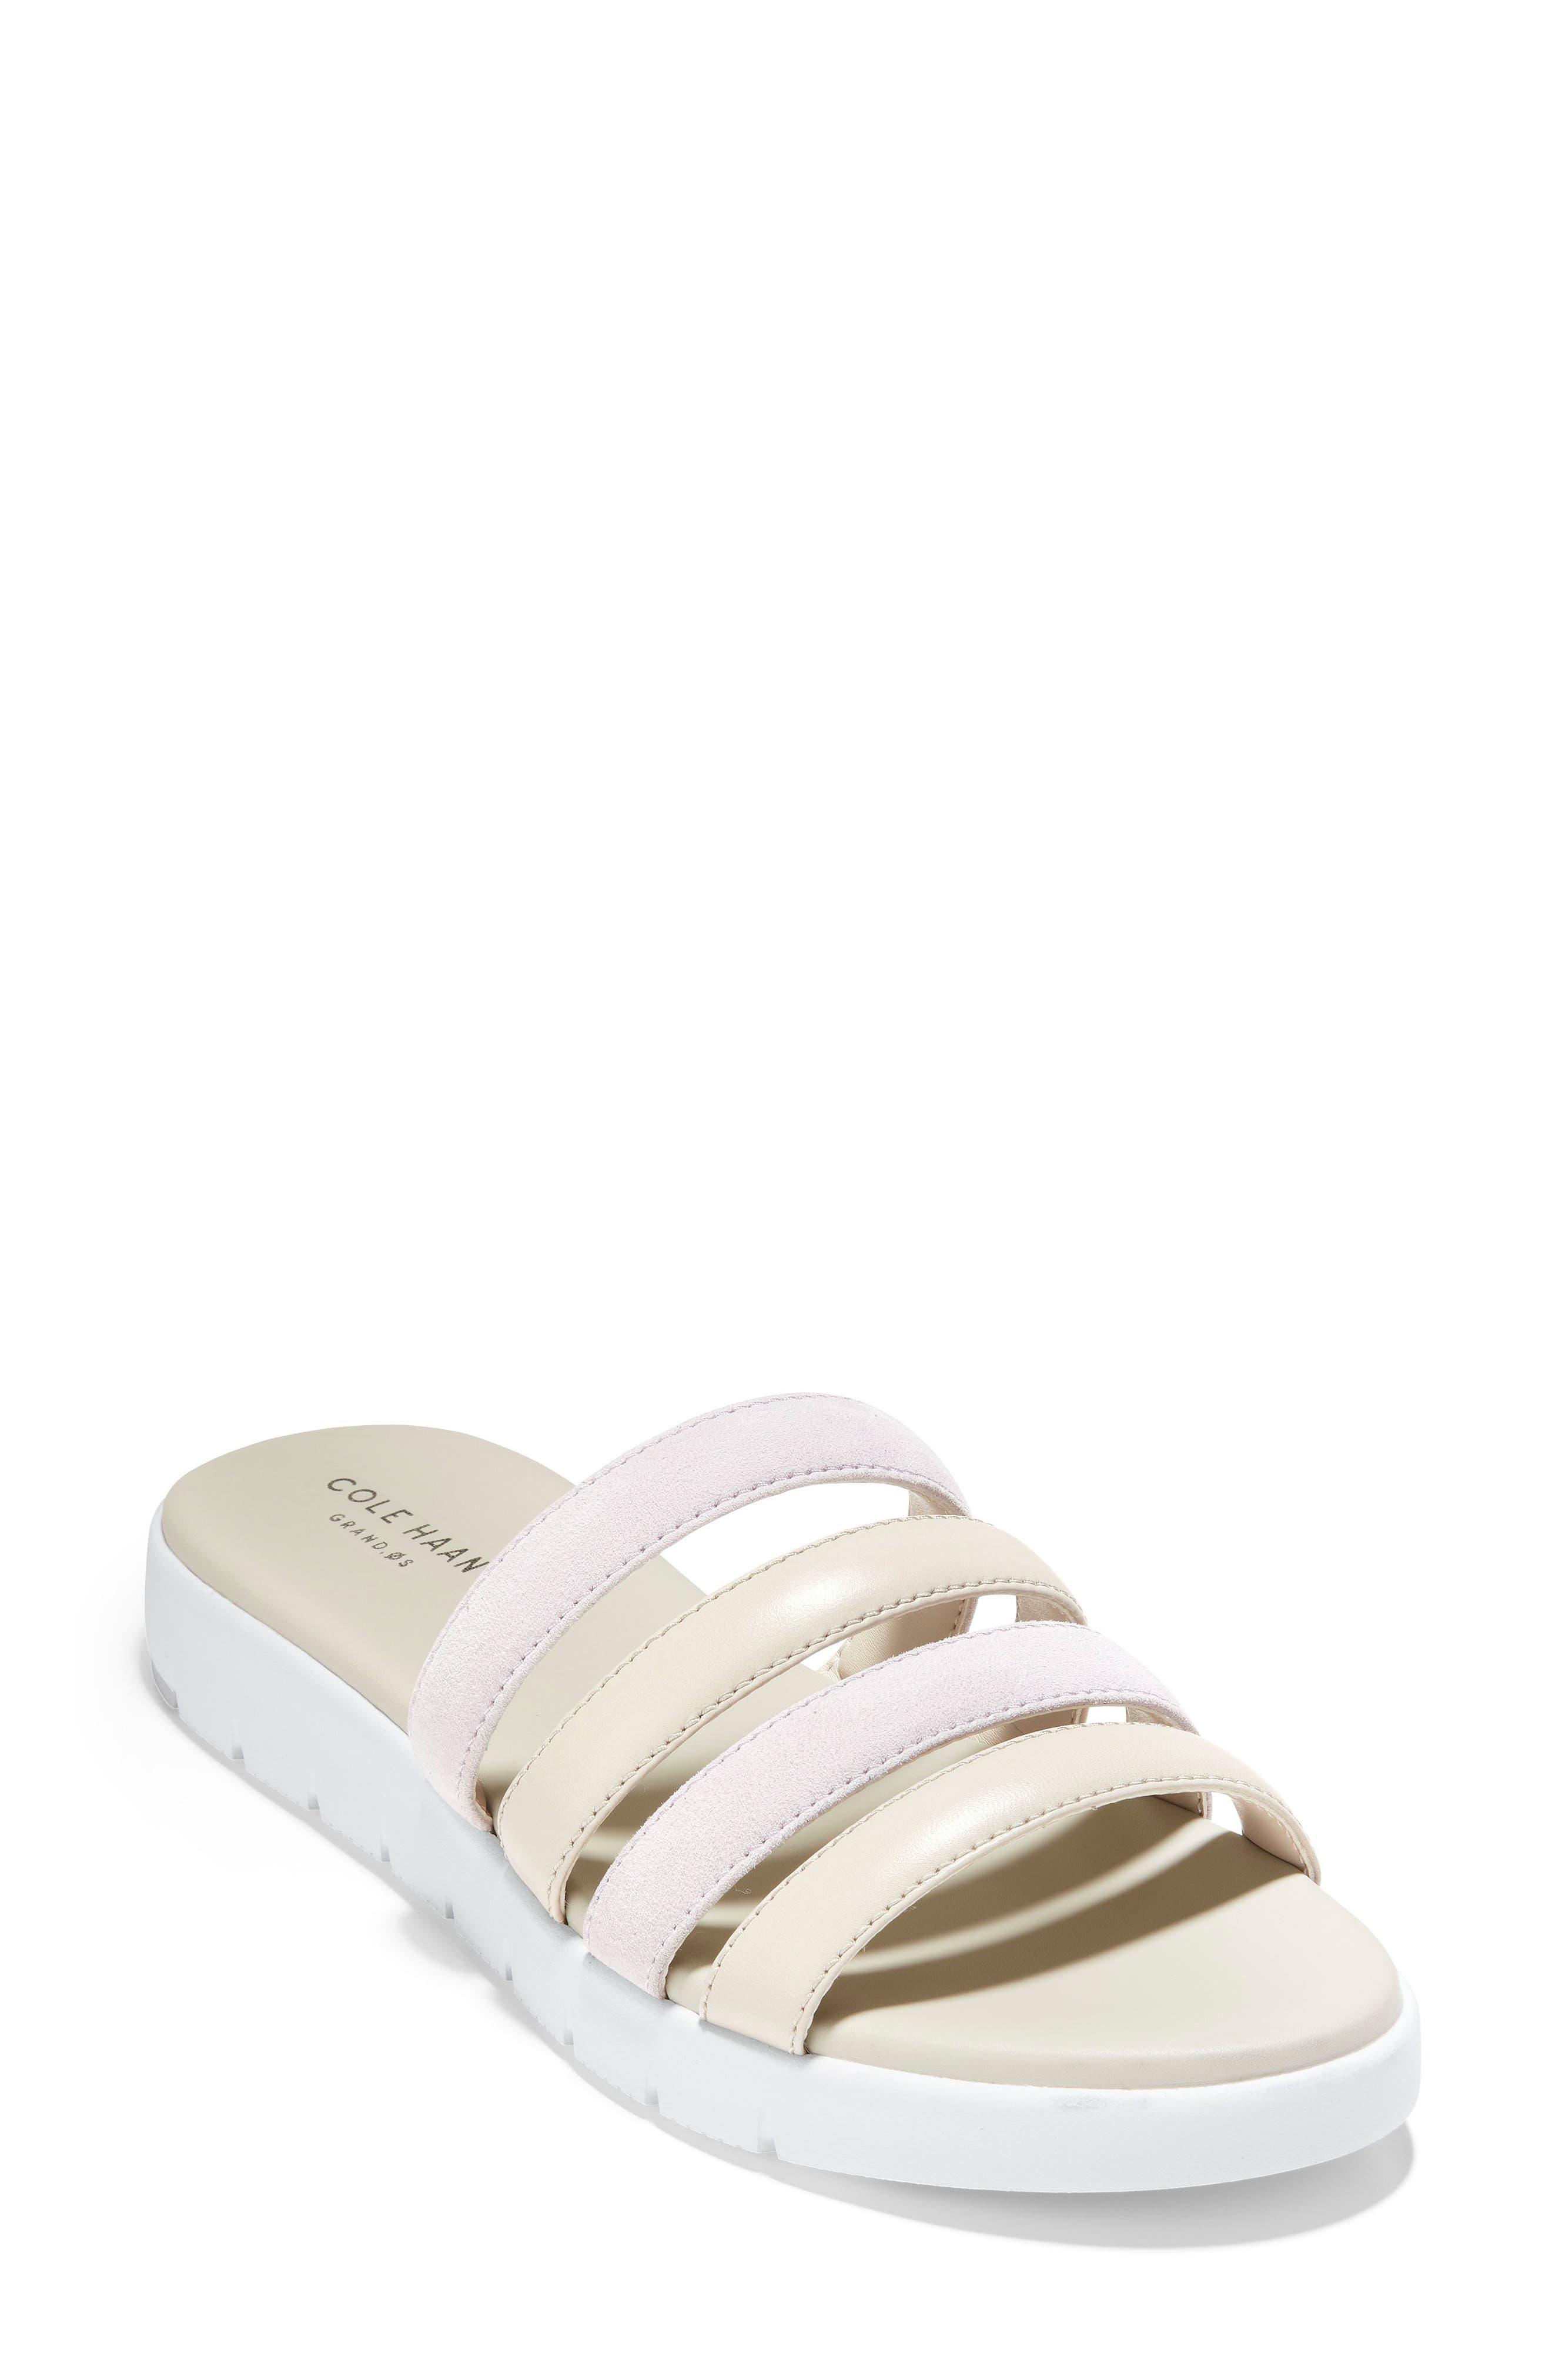 ZeroGrand Sandal, Main, color, VIOLET SUEDE/ STONE LEATHER